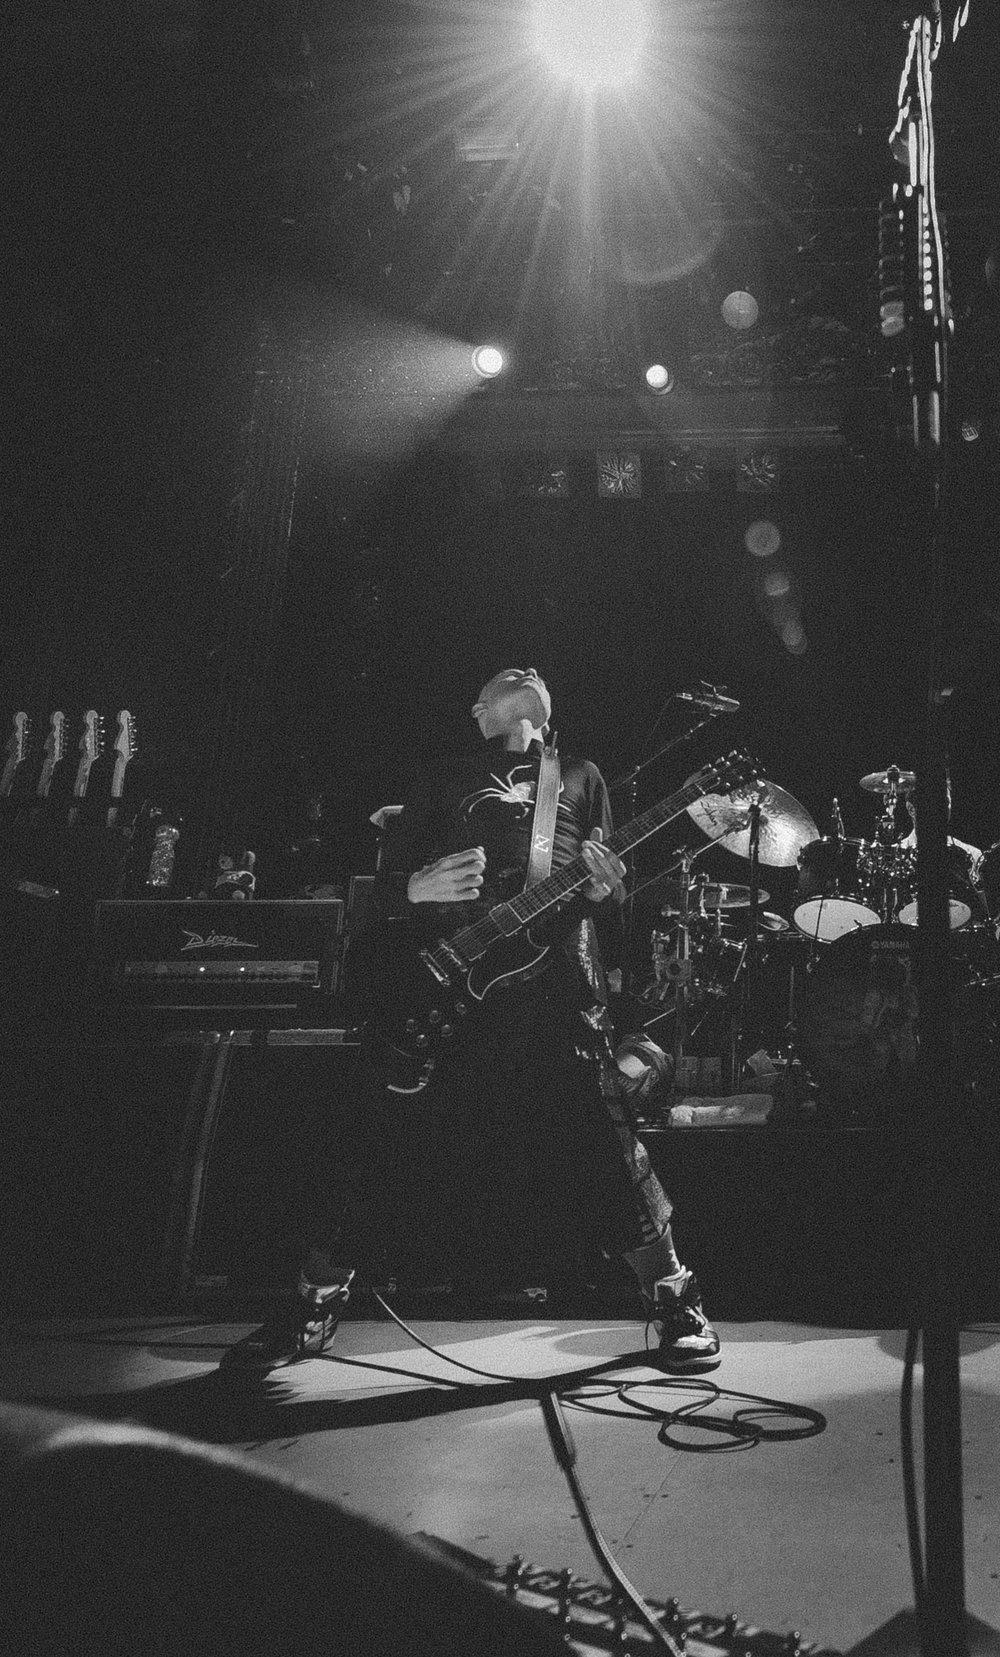 ChadFahnestockPhotography_Concert-037.jpg